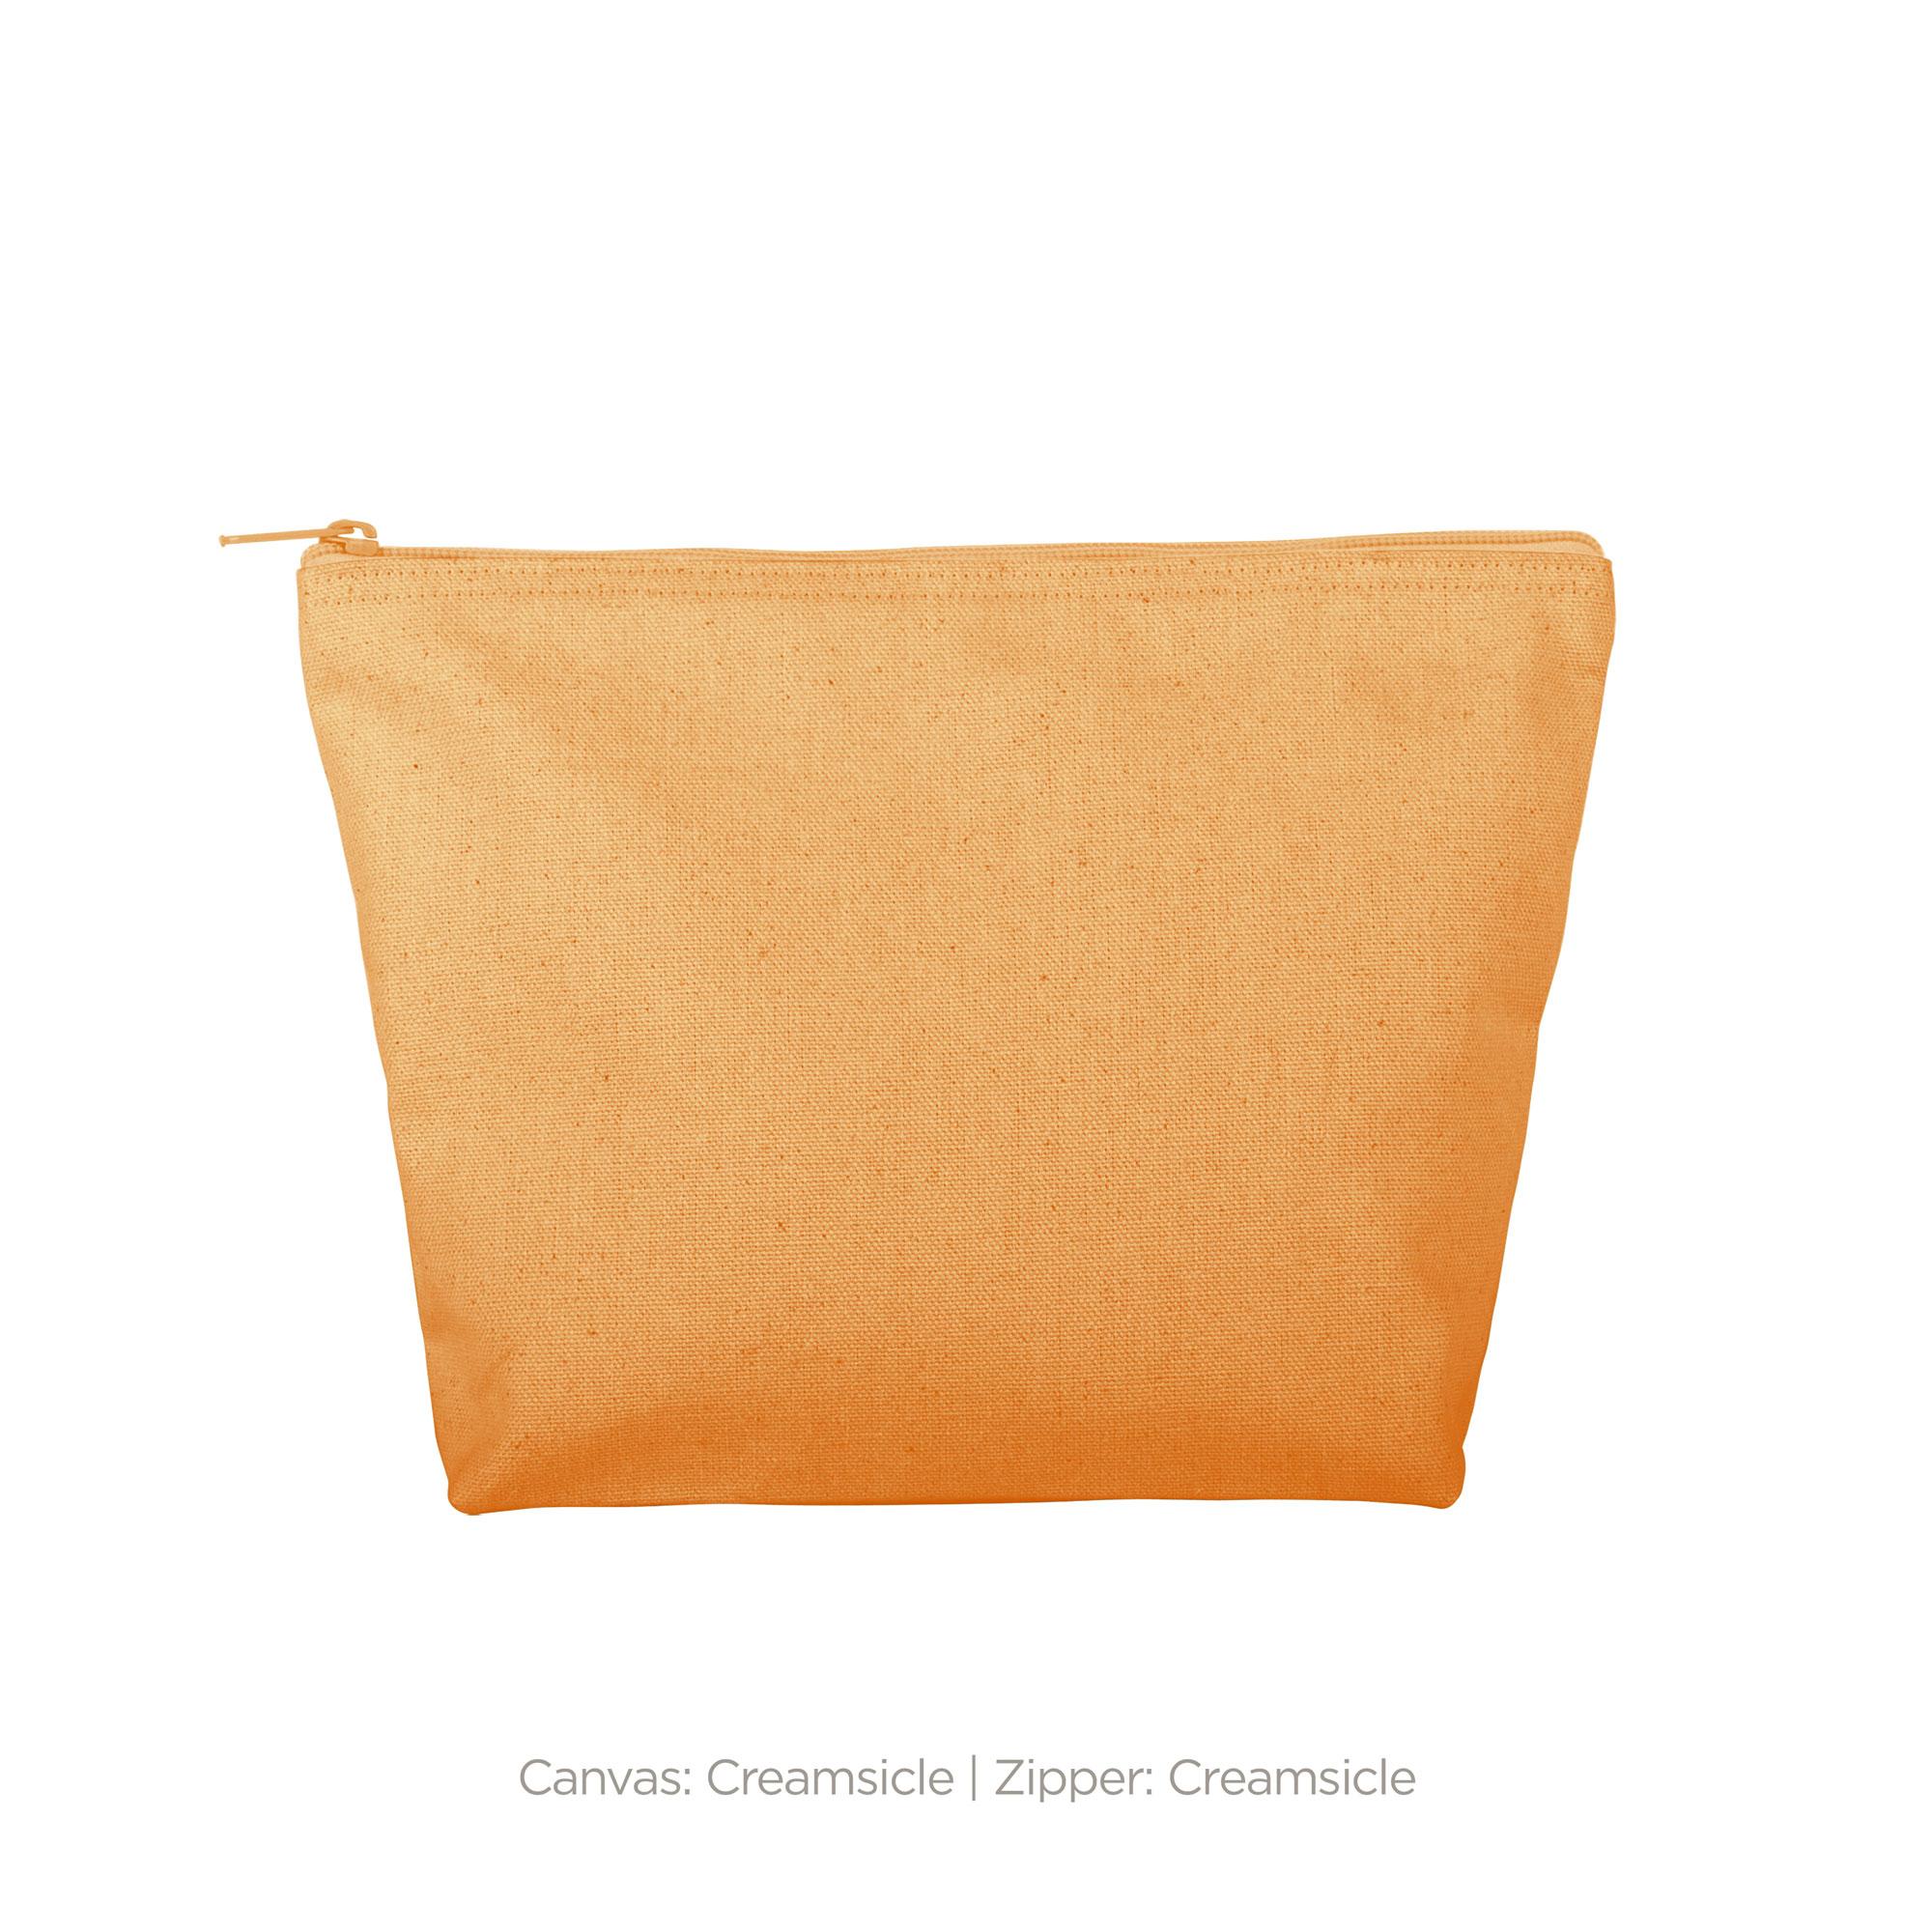 Cramsicle